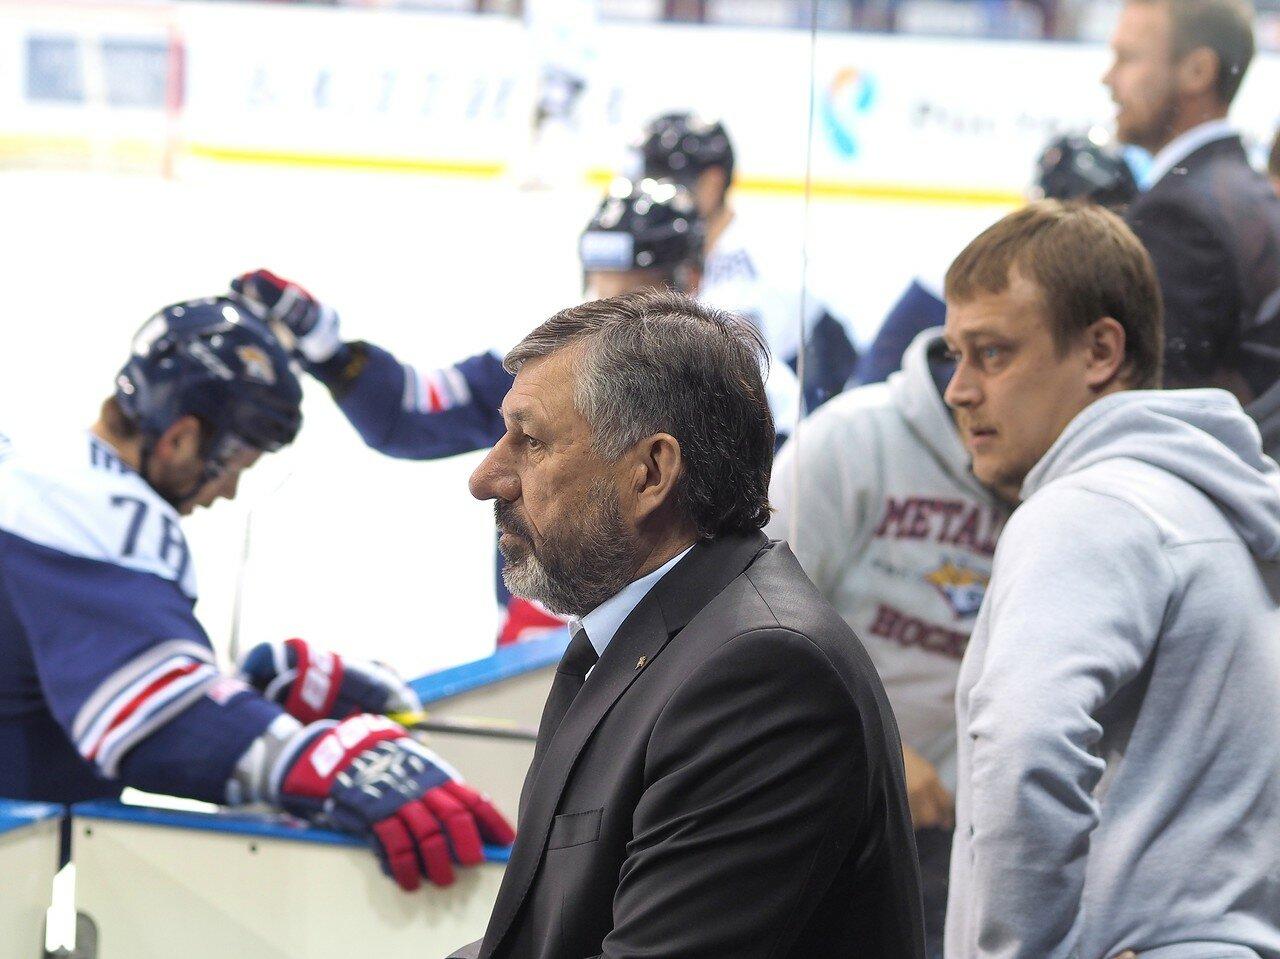 13Плей-офф 2016 Восток 1/2 Металлург - Сибирь 16.03.2016